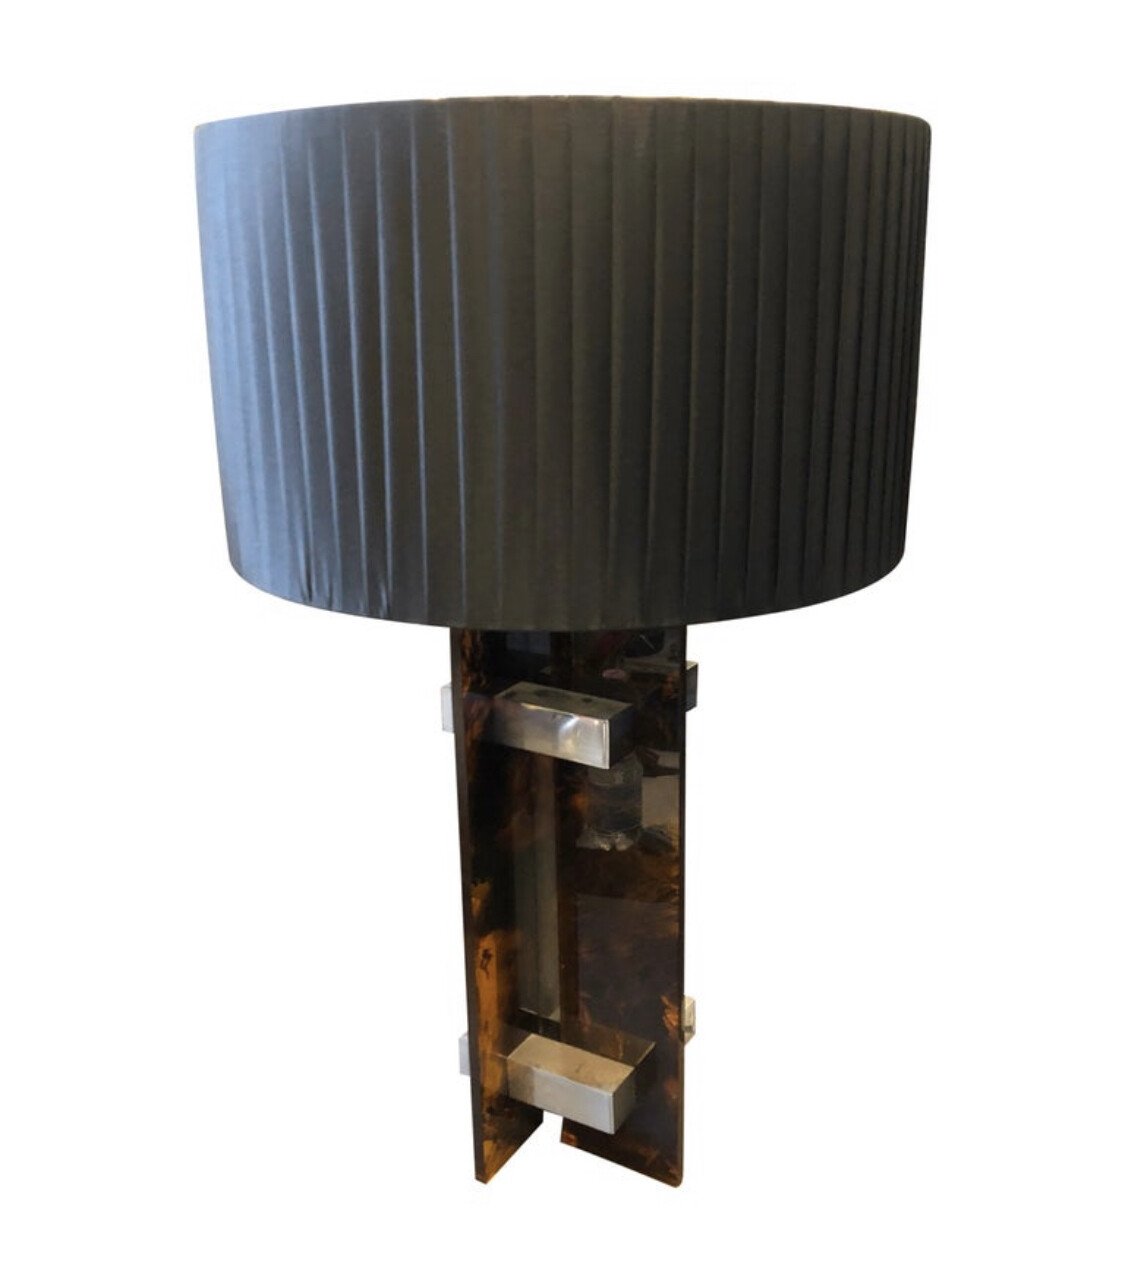 Gaetano Sciolari Mid-Century Modern Lucite and Steel Italian Table Lamp, 1970